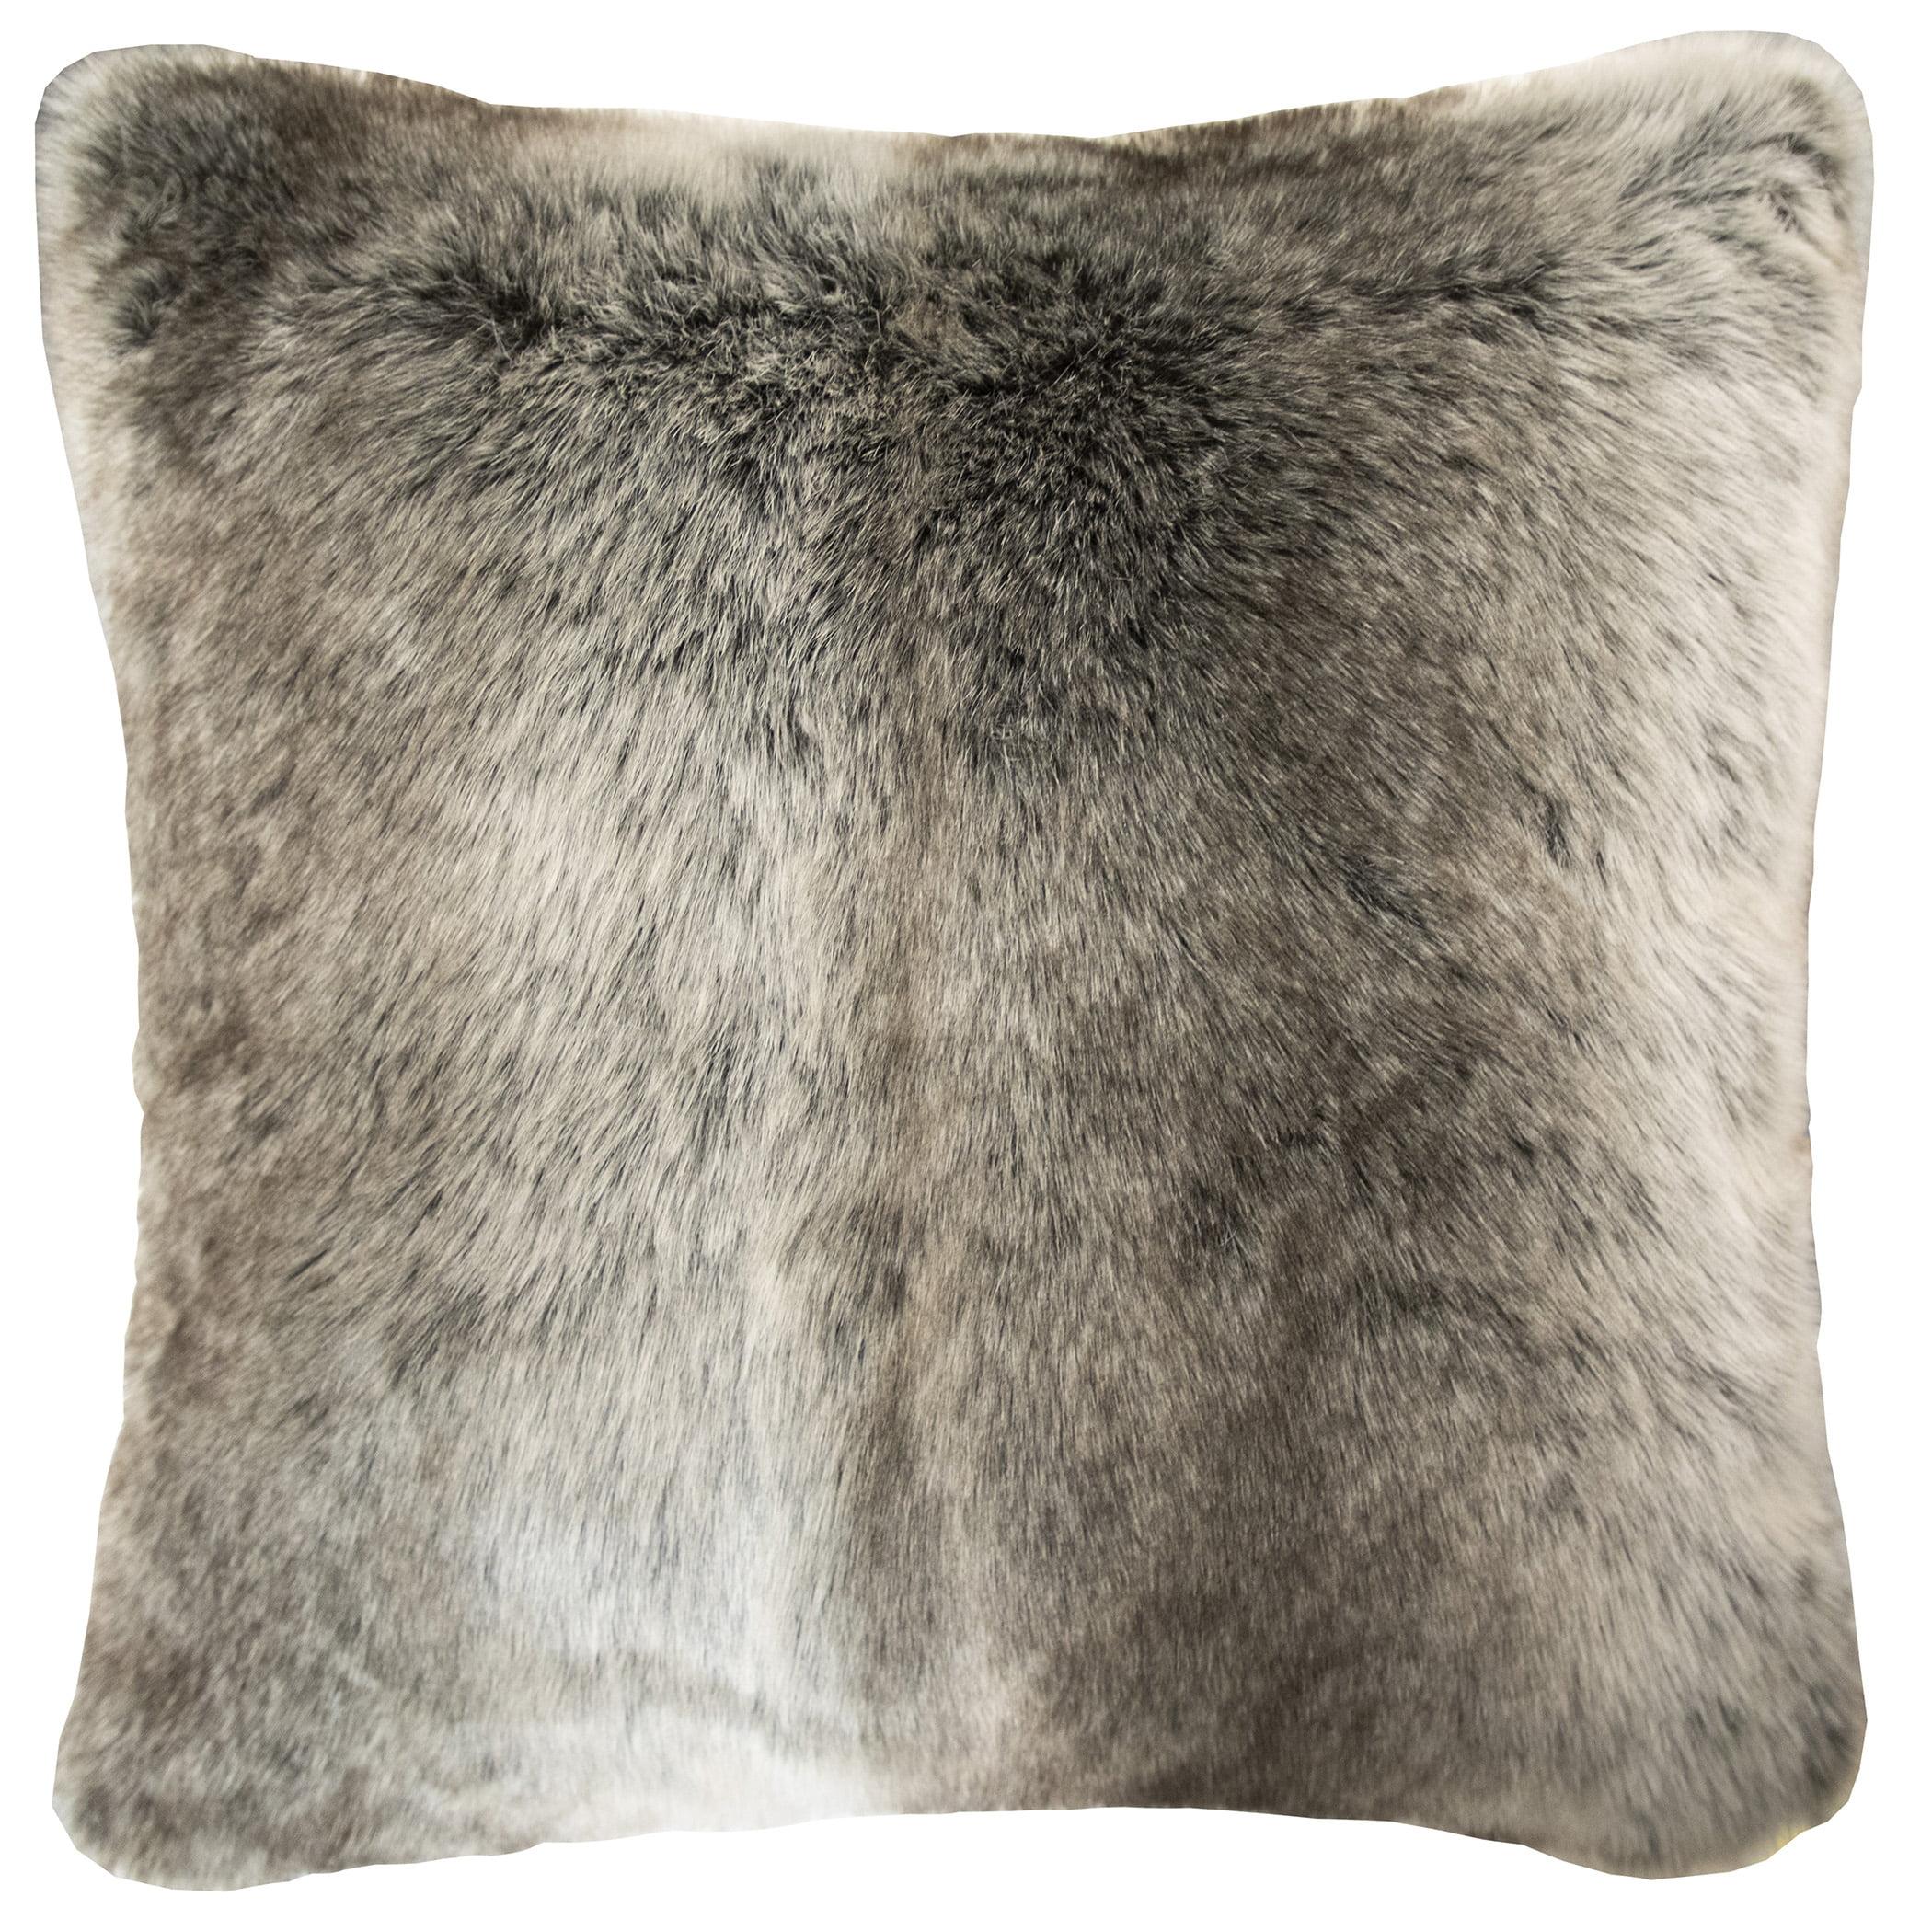 Better Homes Gardens Ombre Fur Decorative Pillow 20 X 20 Brown Walmart Com Walmart Com